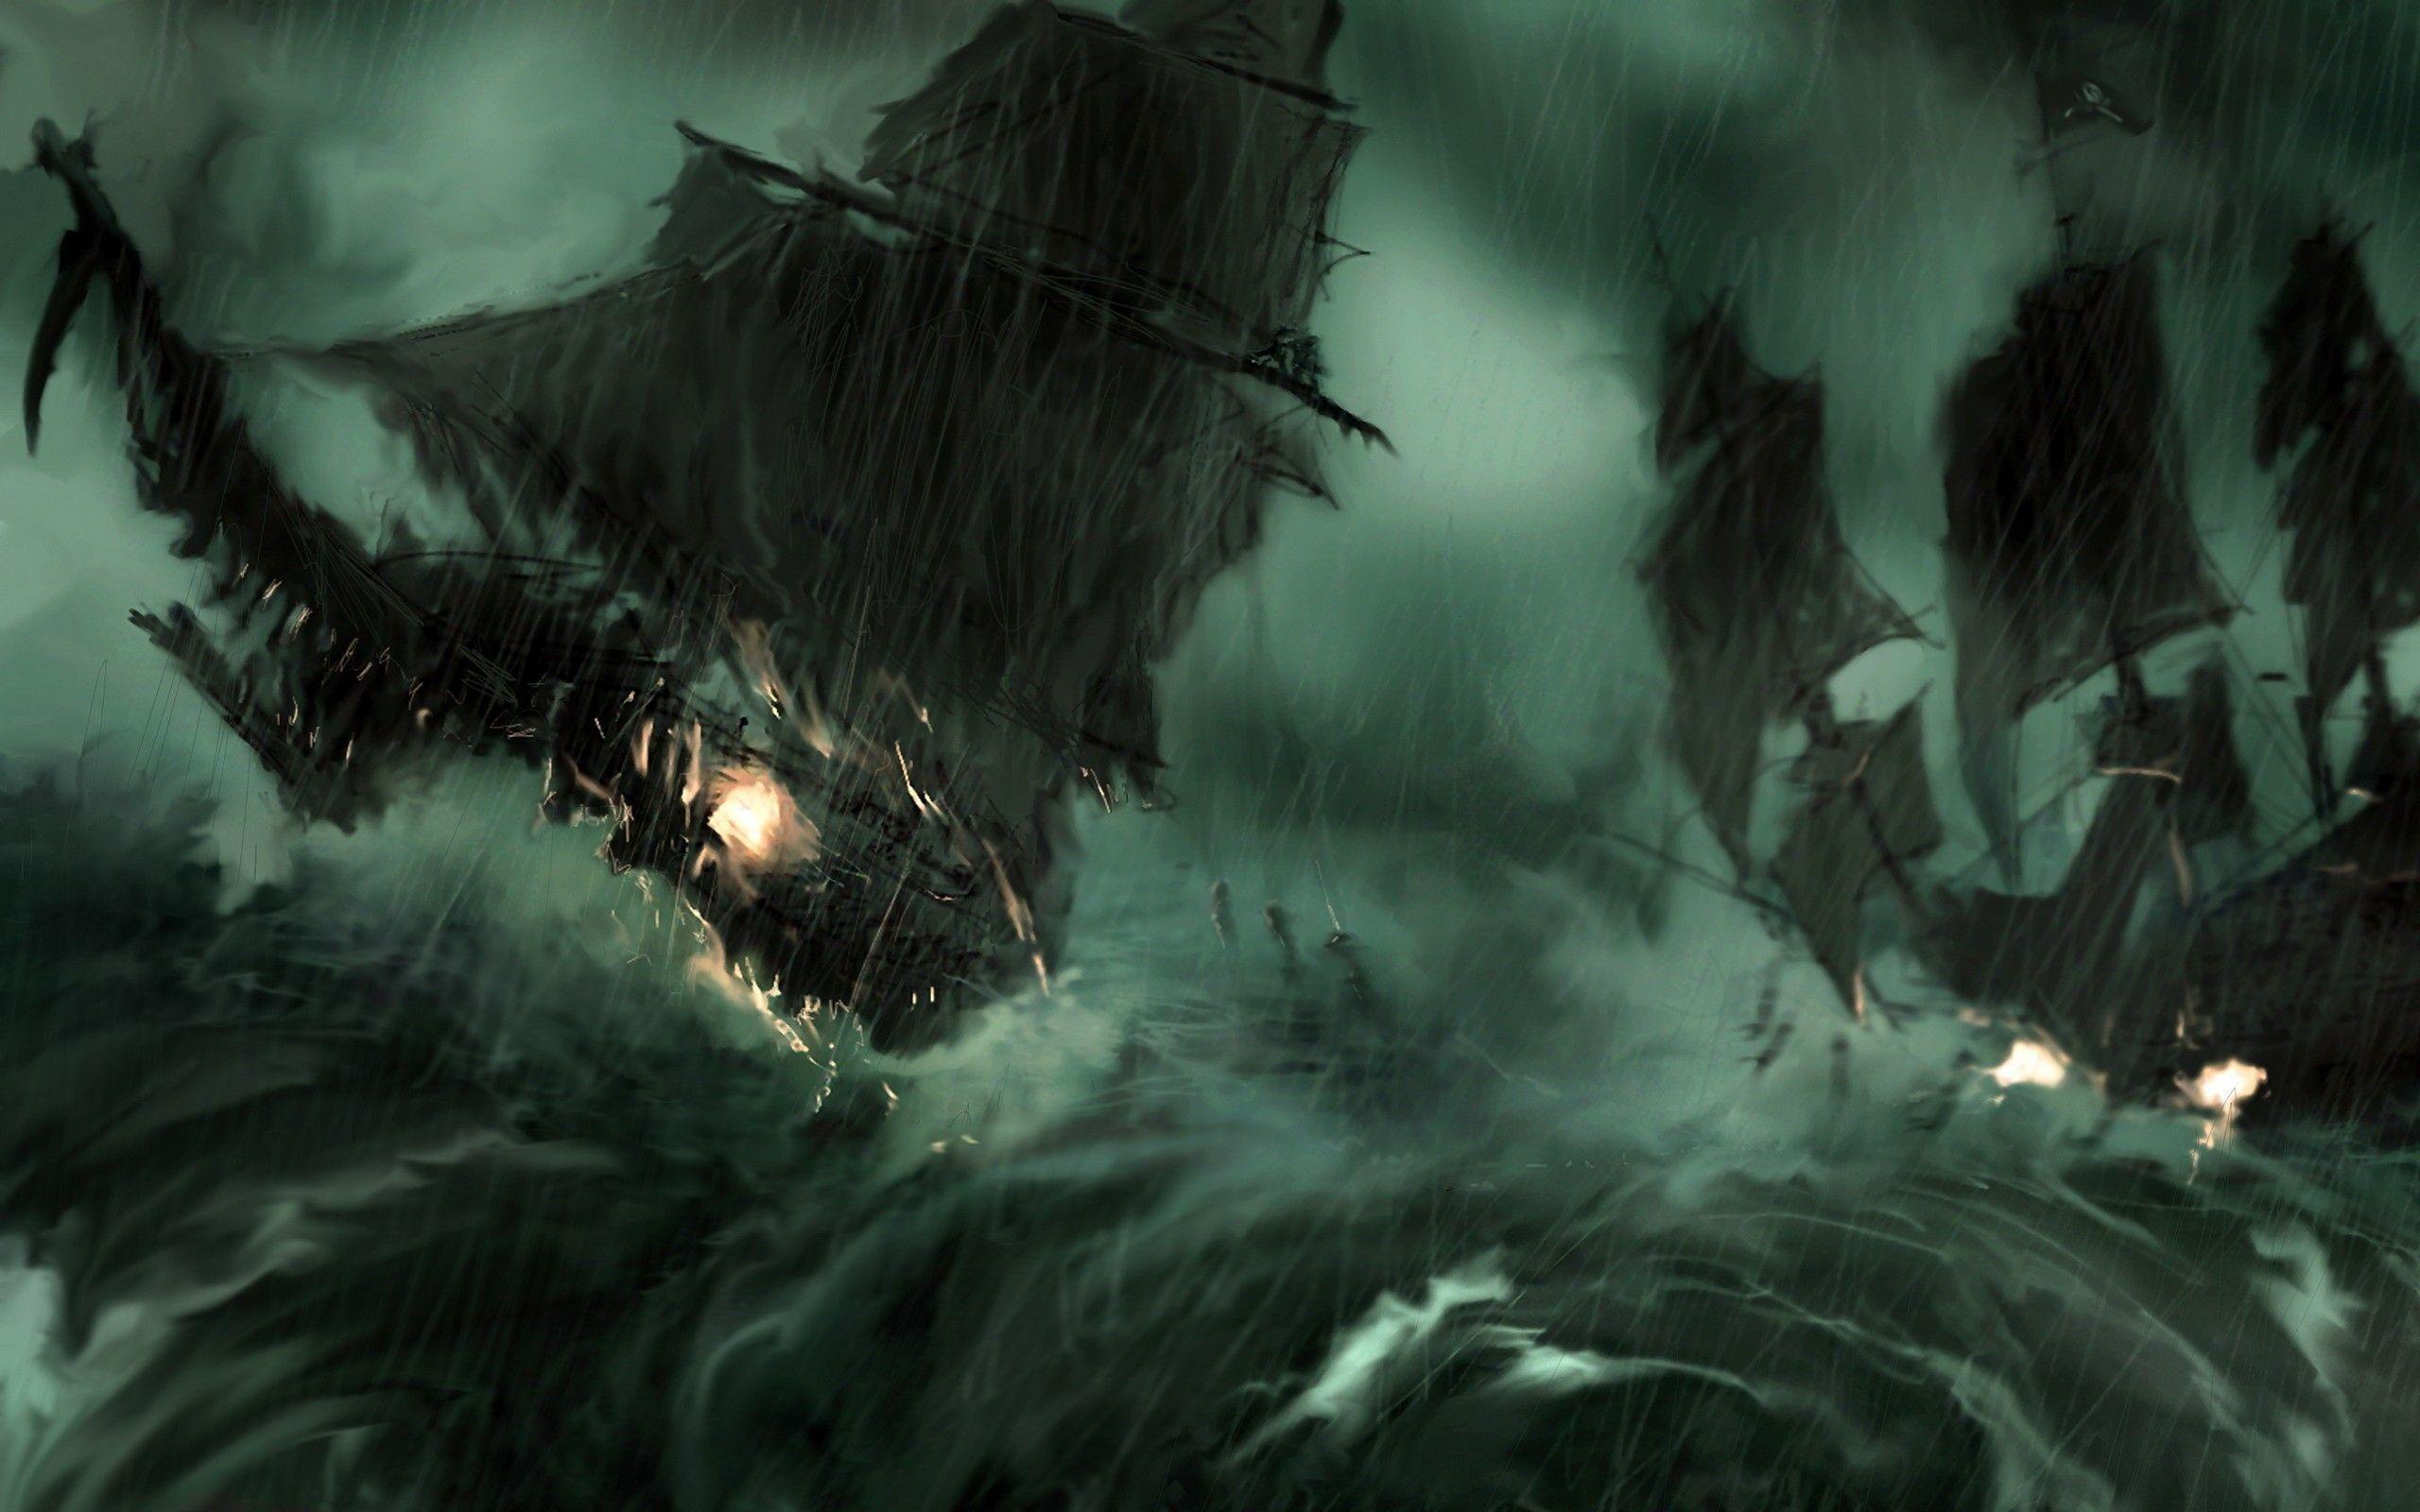 Paintings rain pirate ship storm pirates of the caribbean artwork .